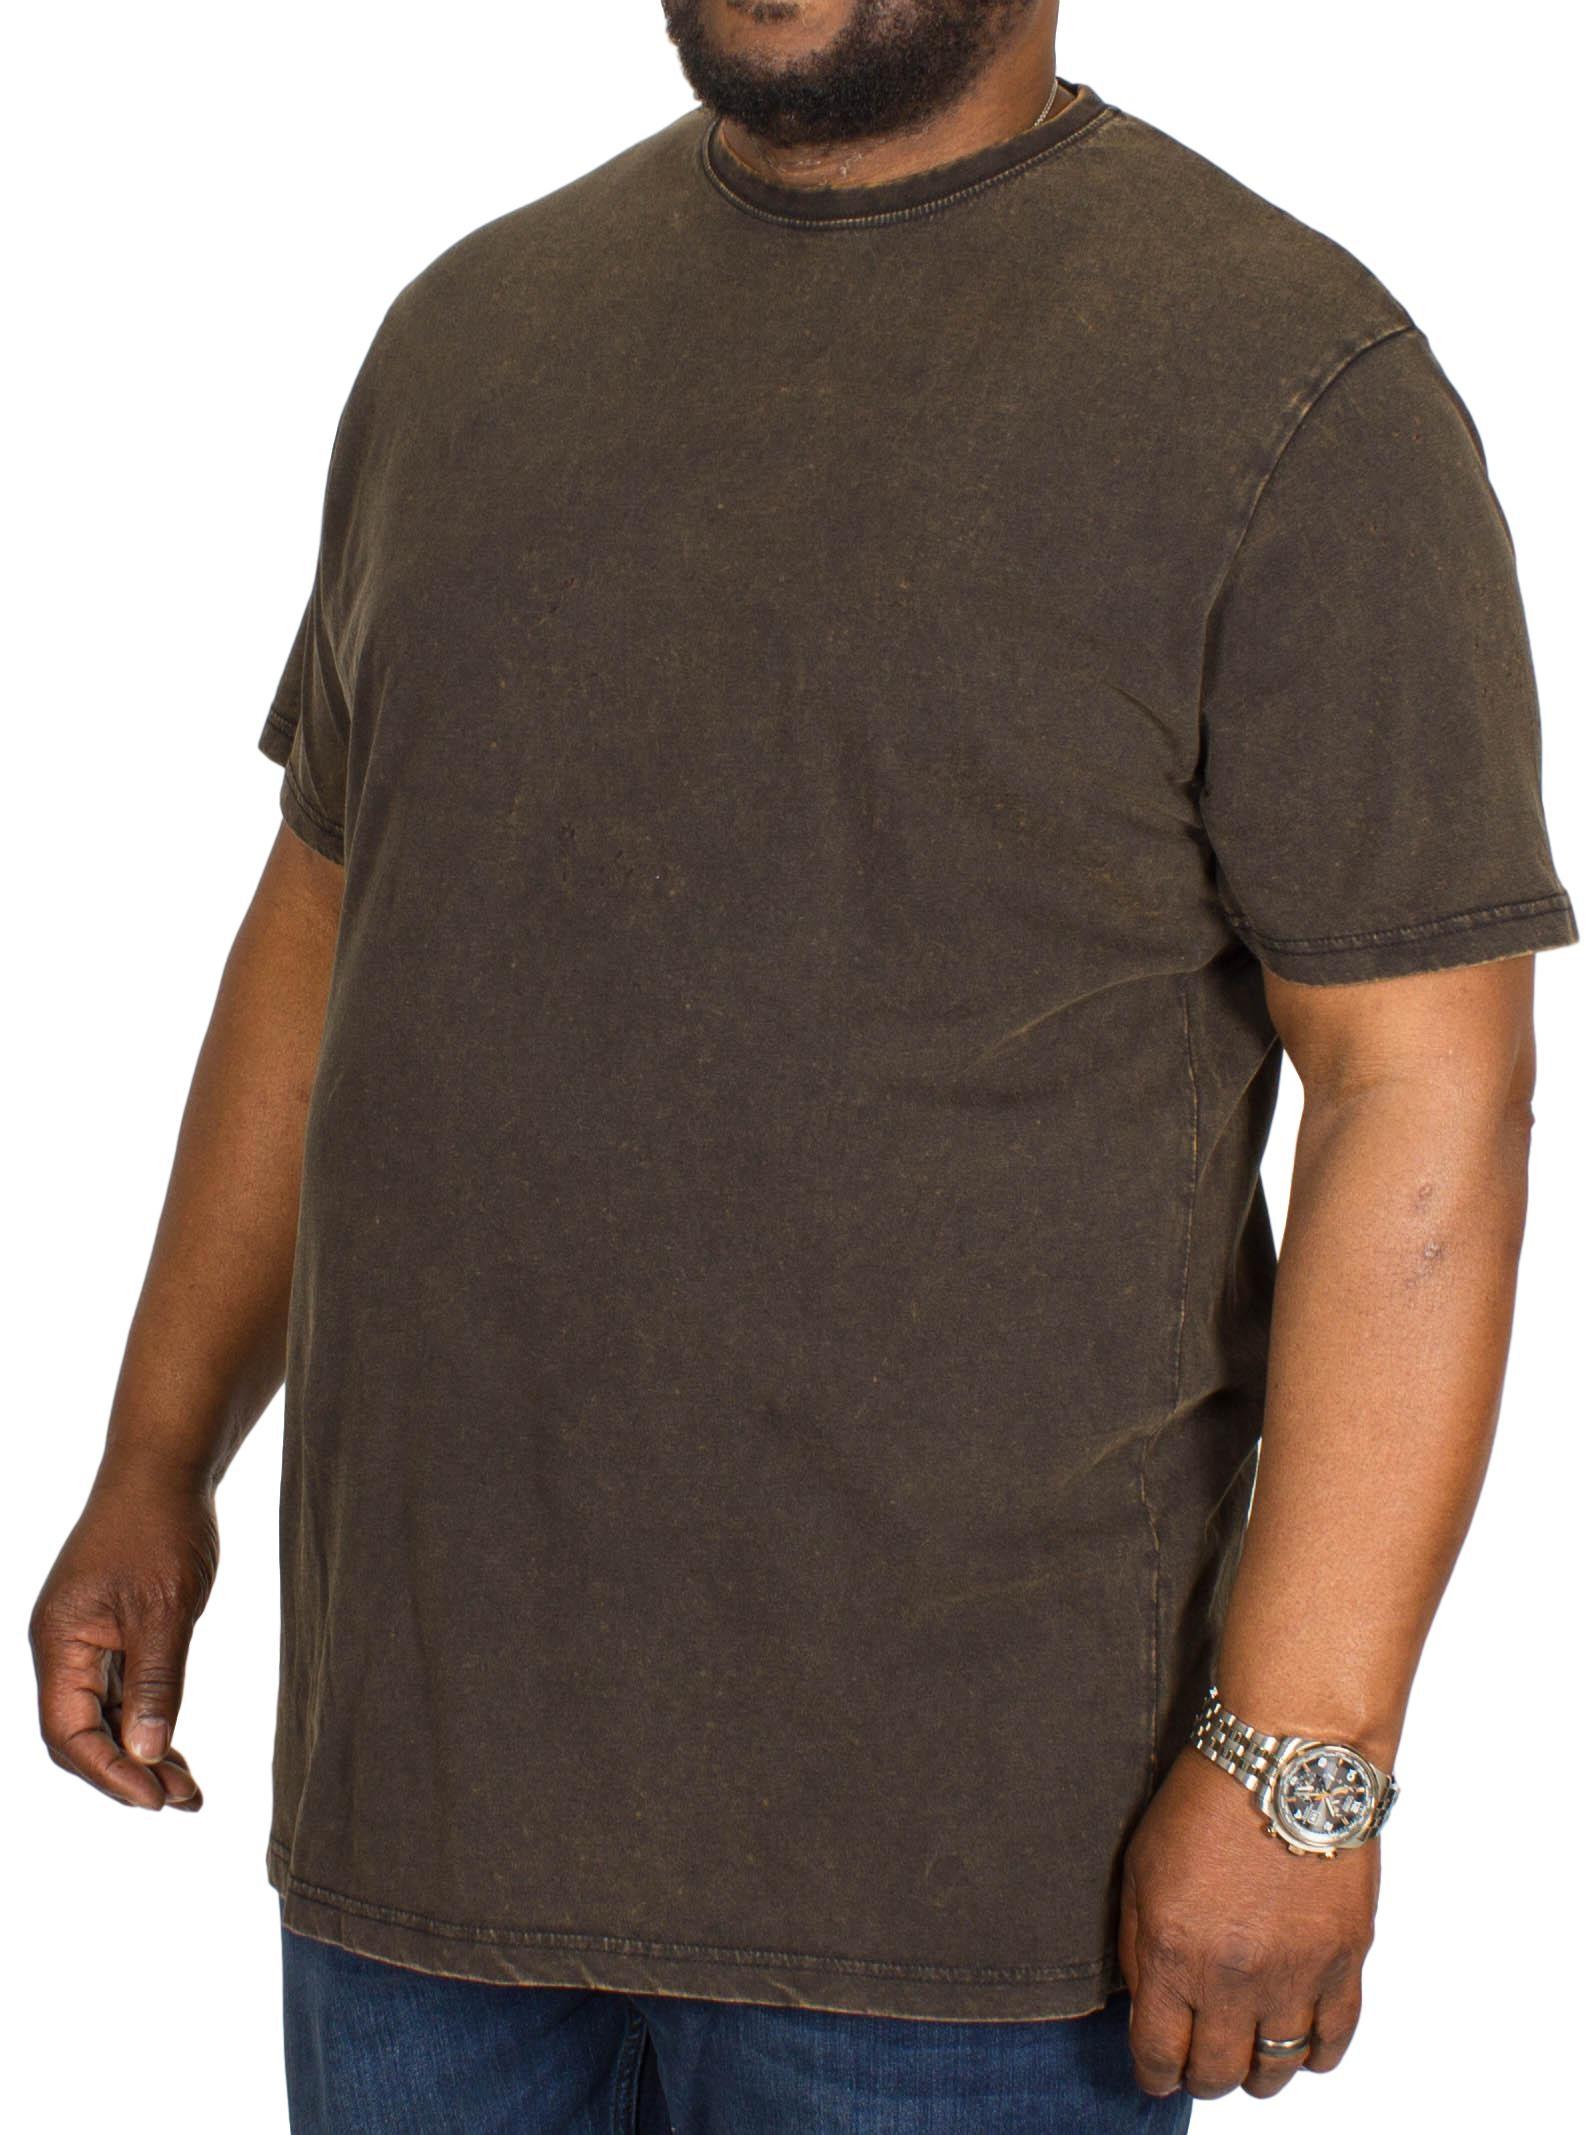 Bigdude Acid Wash Crew Neck T-Shirt Black